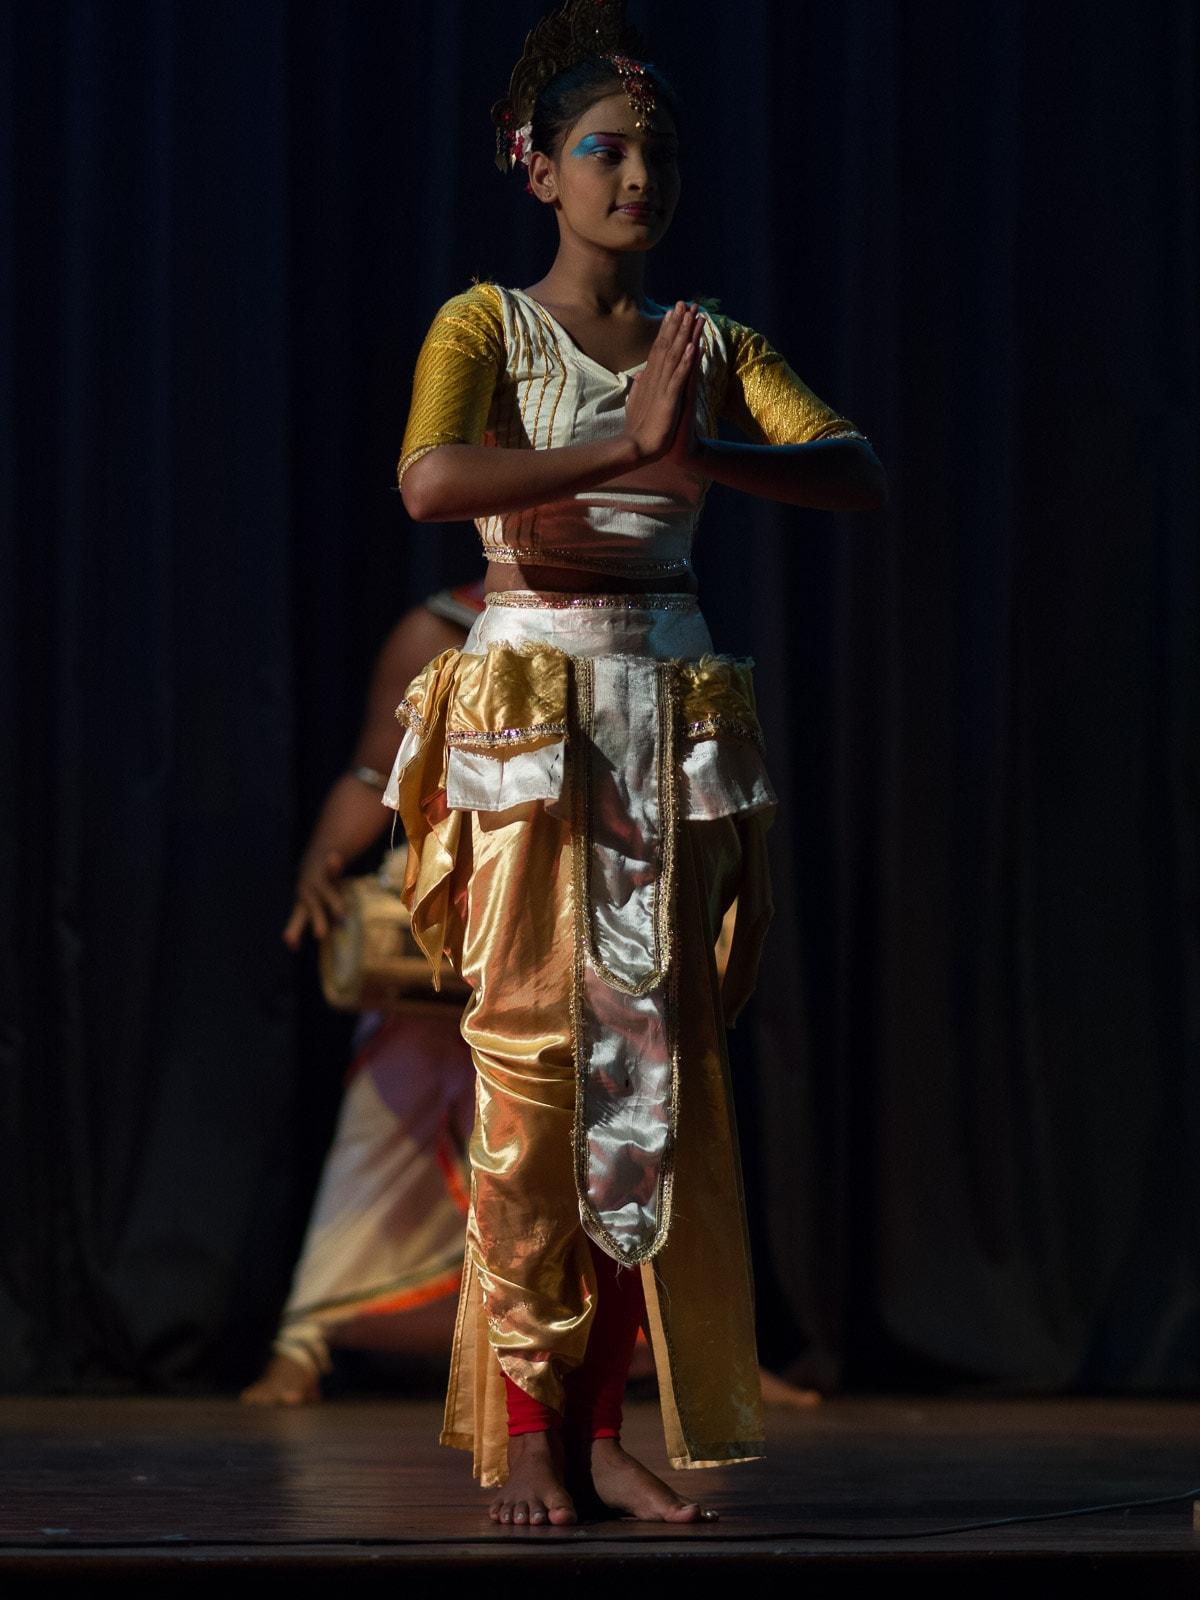 20160701-sri lanka-486